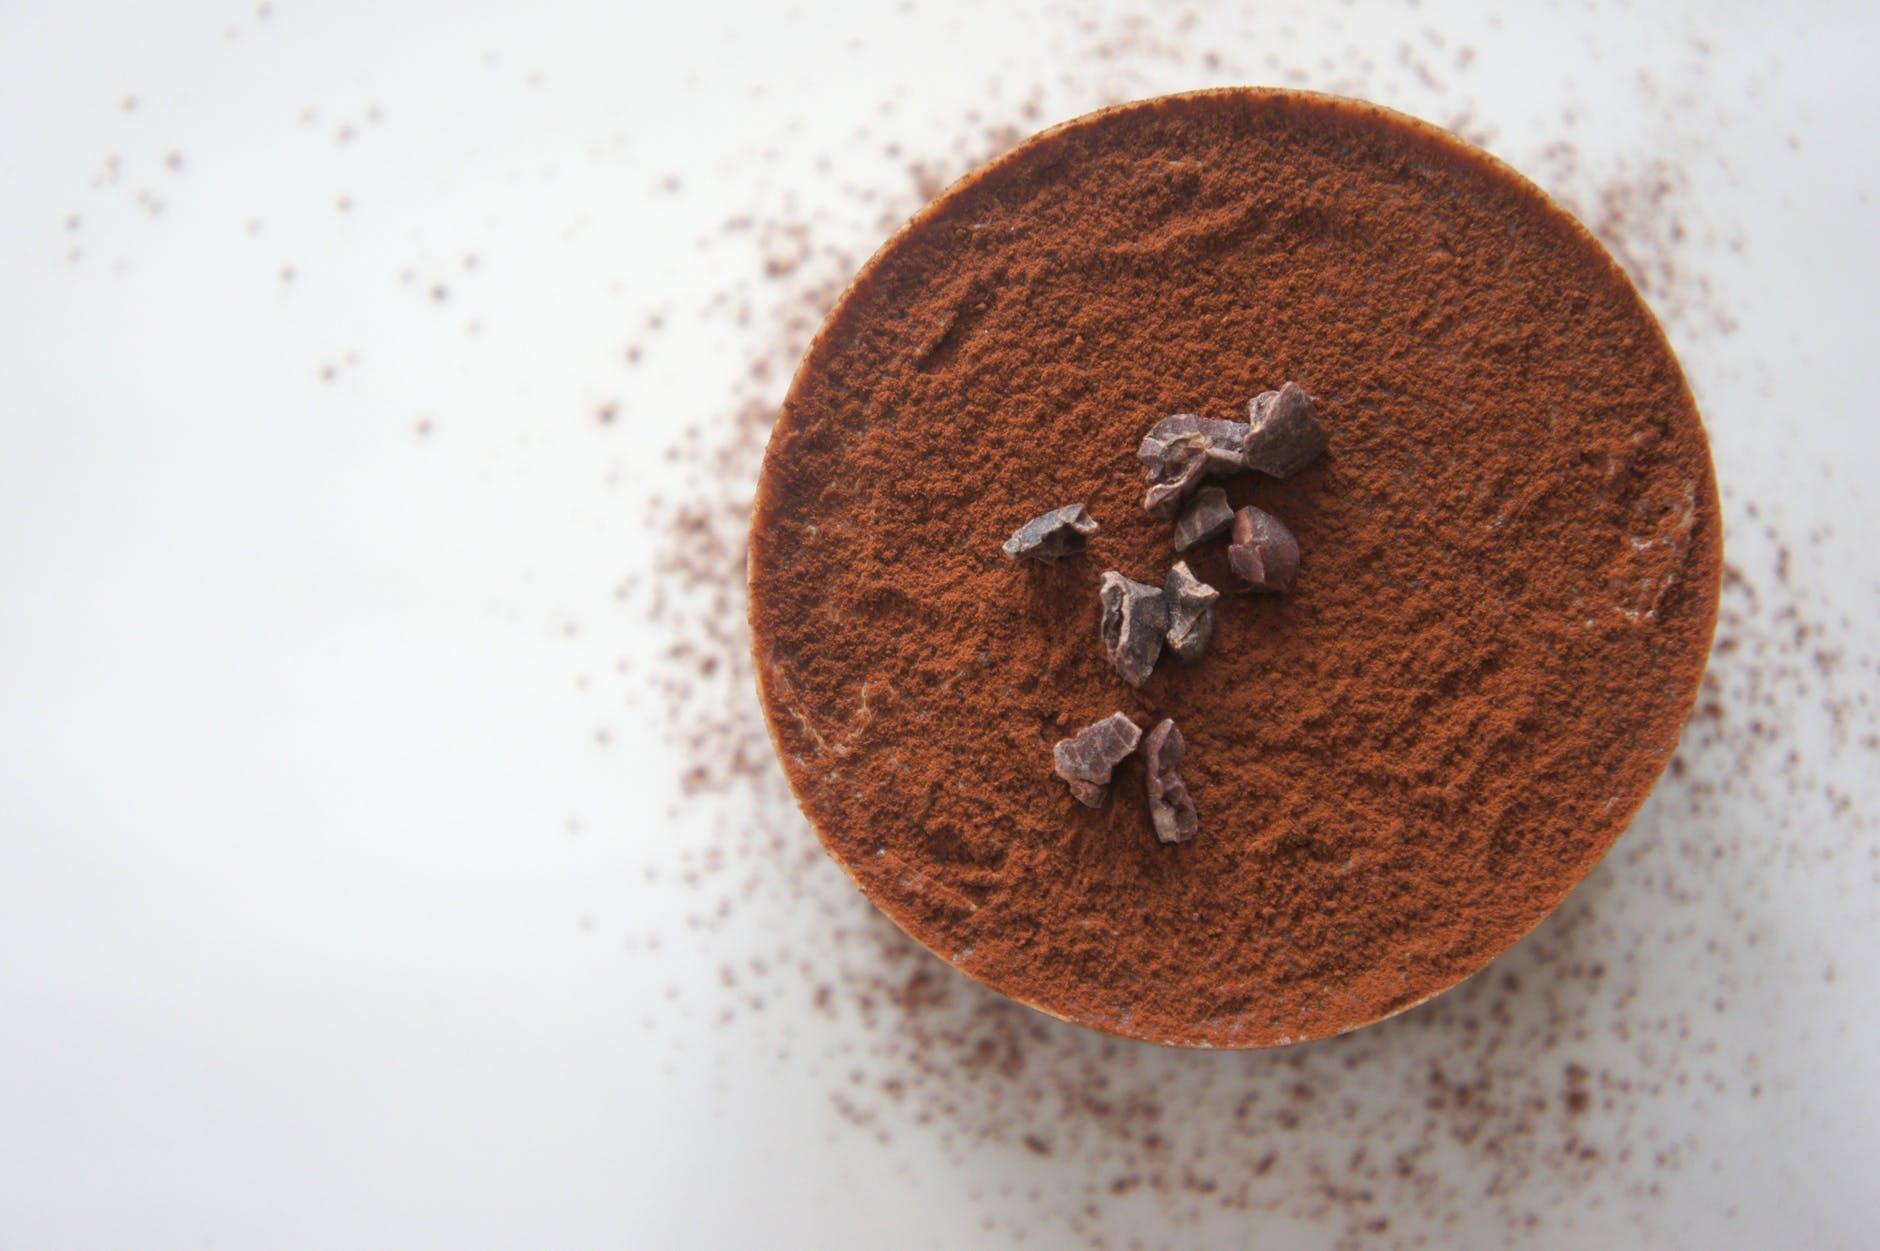 kakao jako superfoods